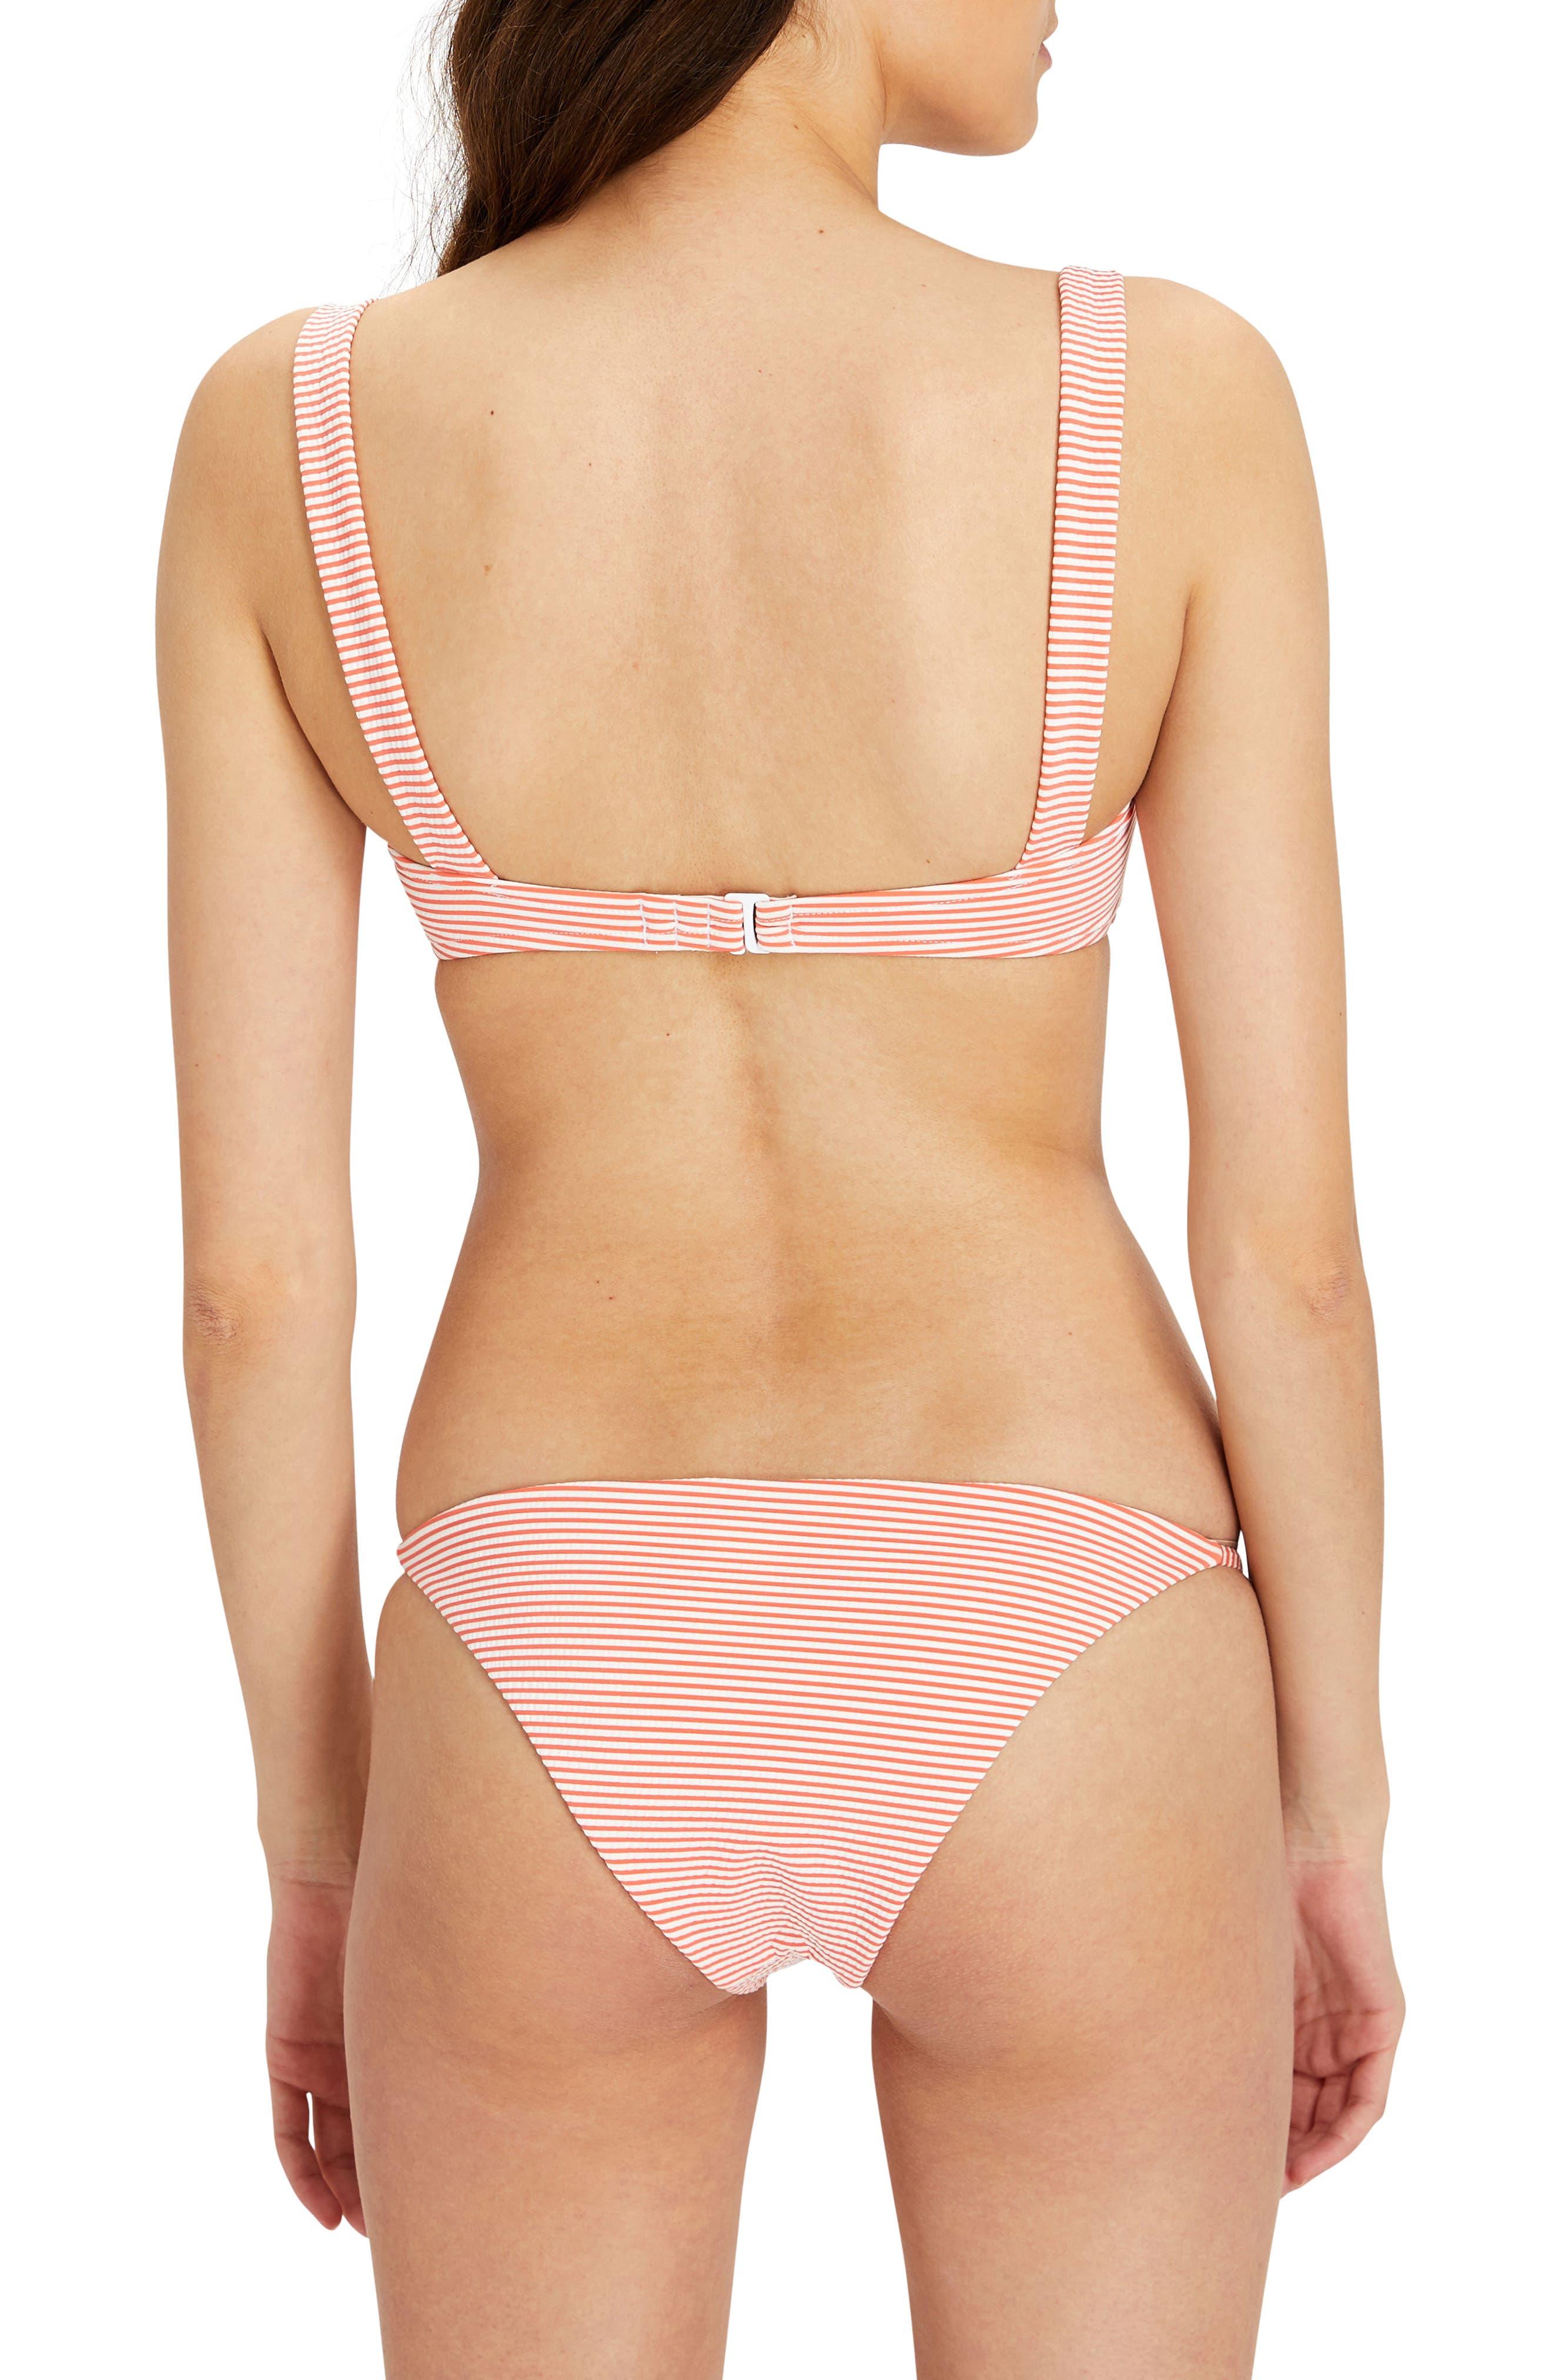 Kirsten Structured Bikini Top,                             Alternate thumbnail 4, color,                             Sunrise/ White